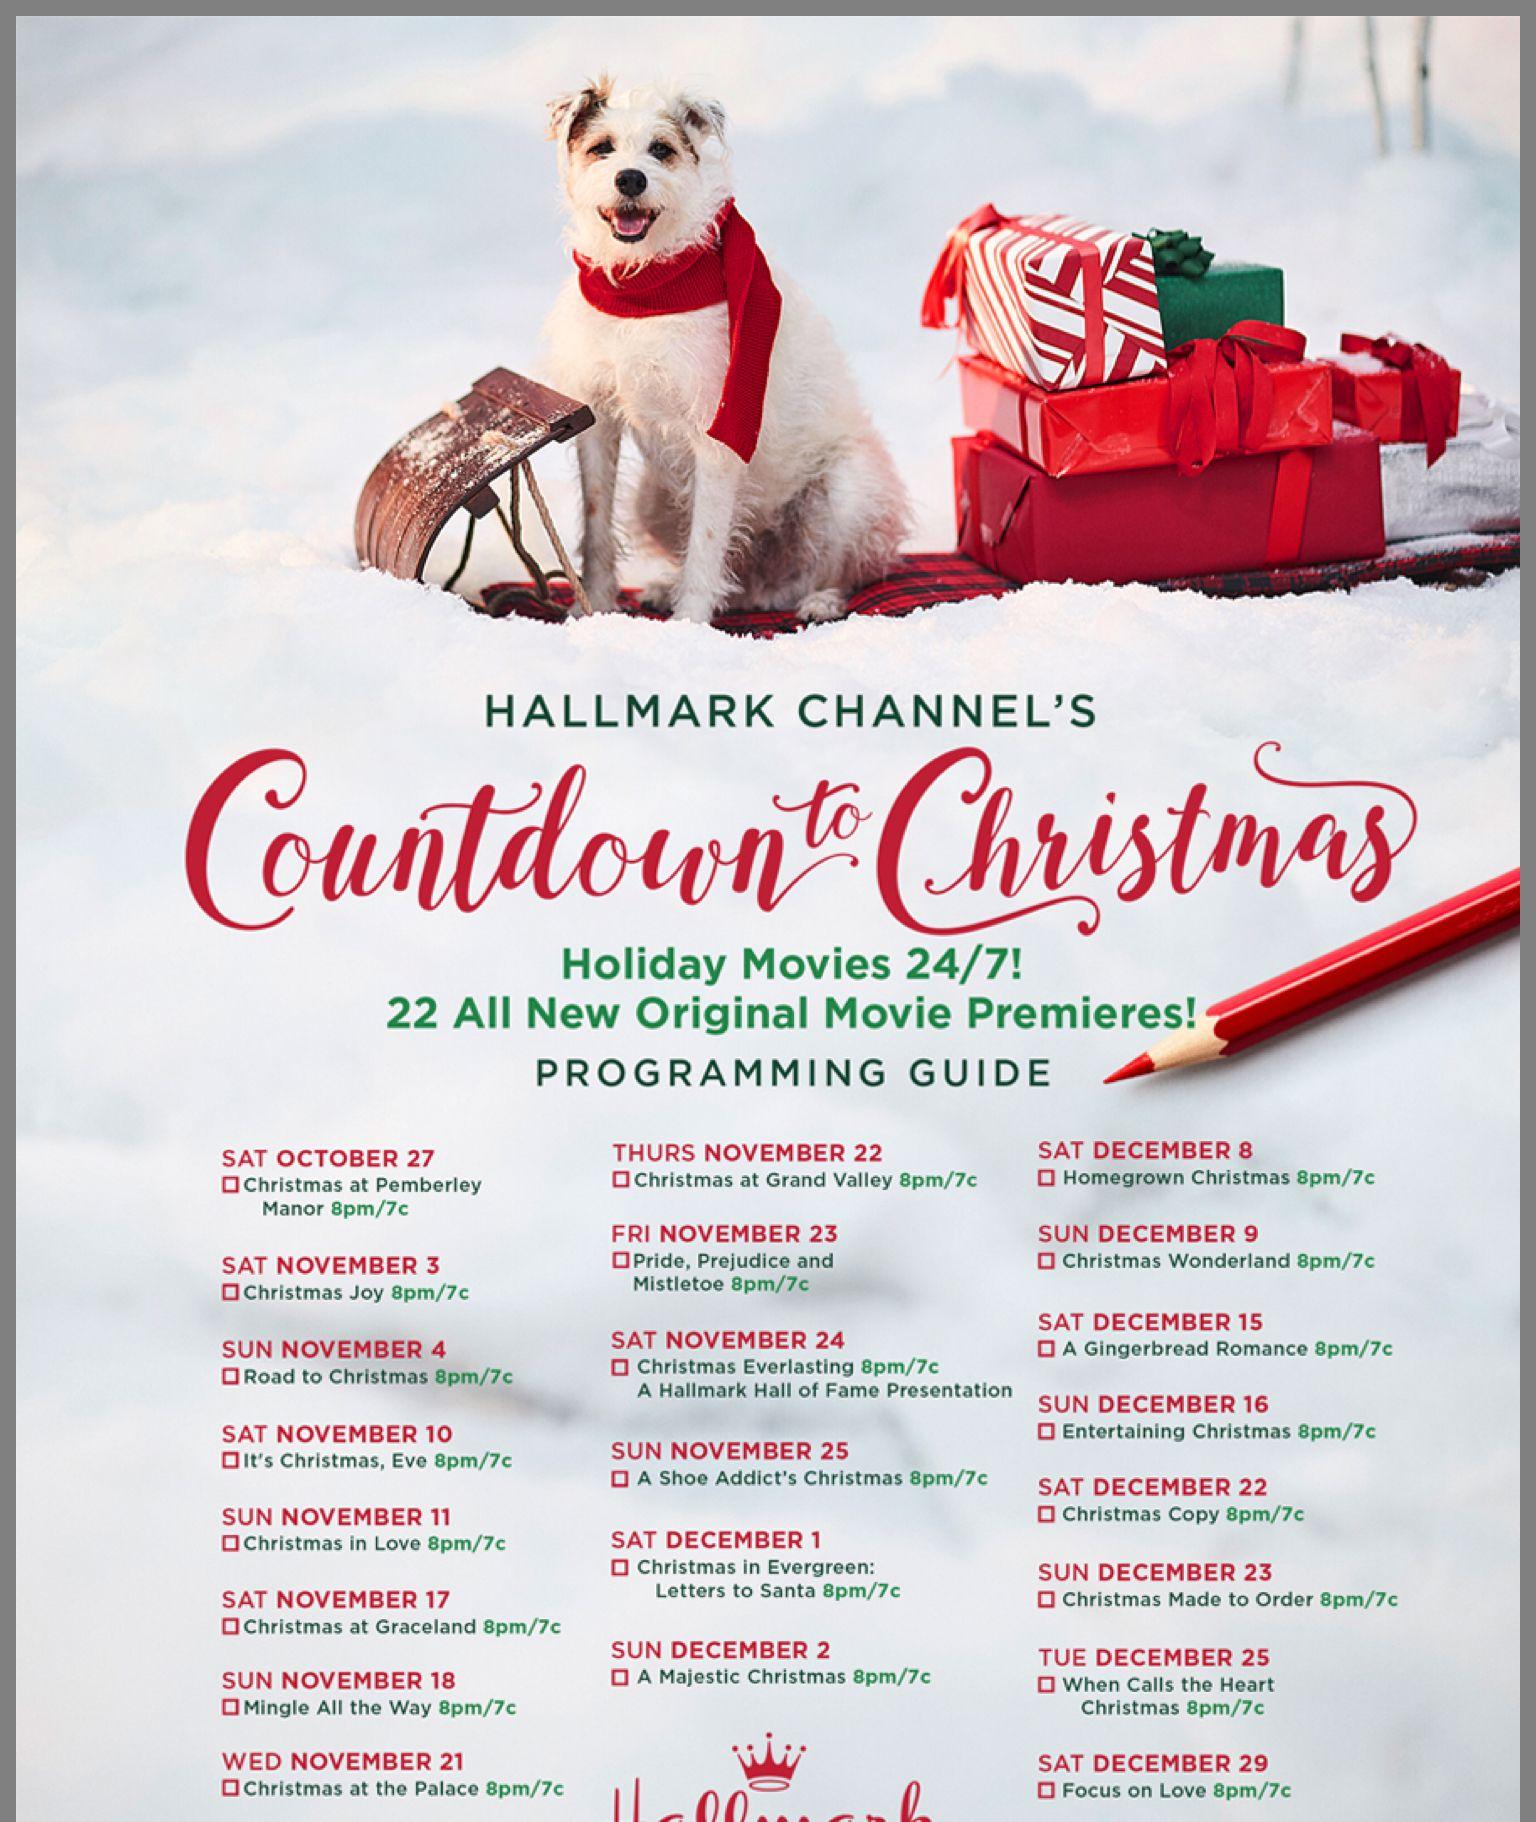 CountdownToChristmas #RubyTuesday #HallmarkChannel #sweepstakes ...